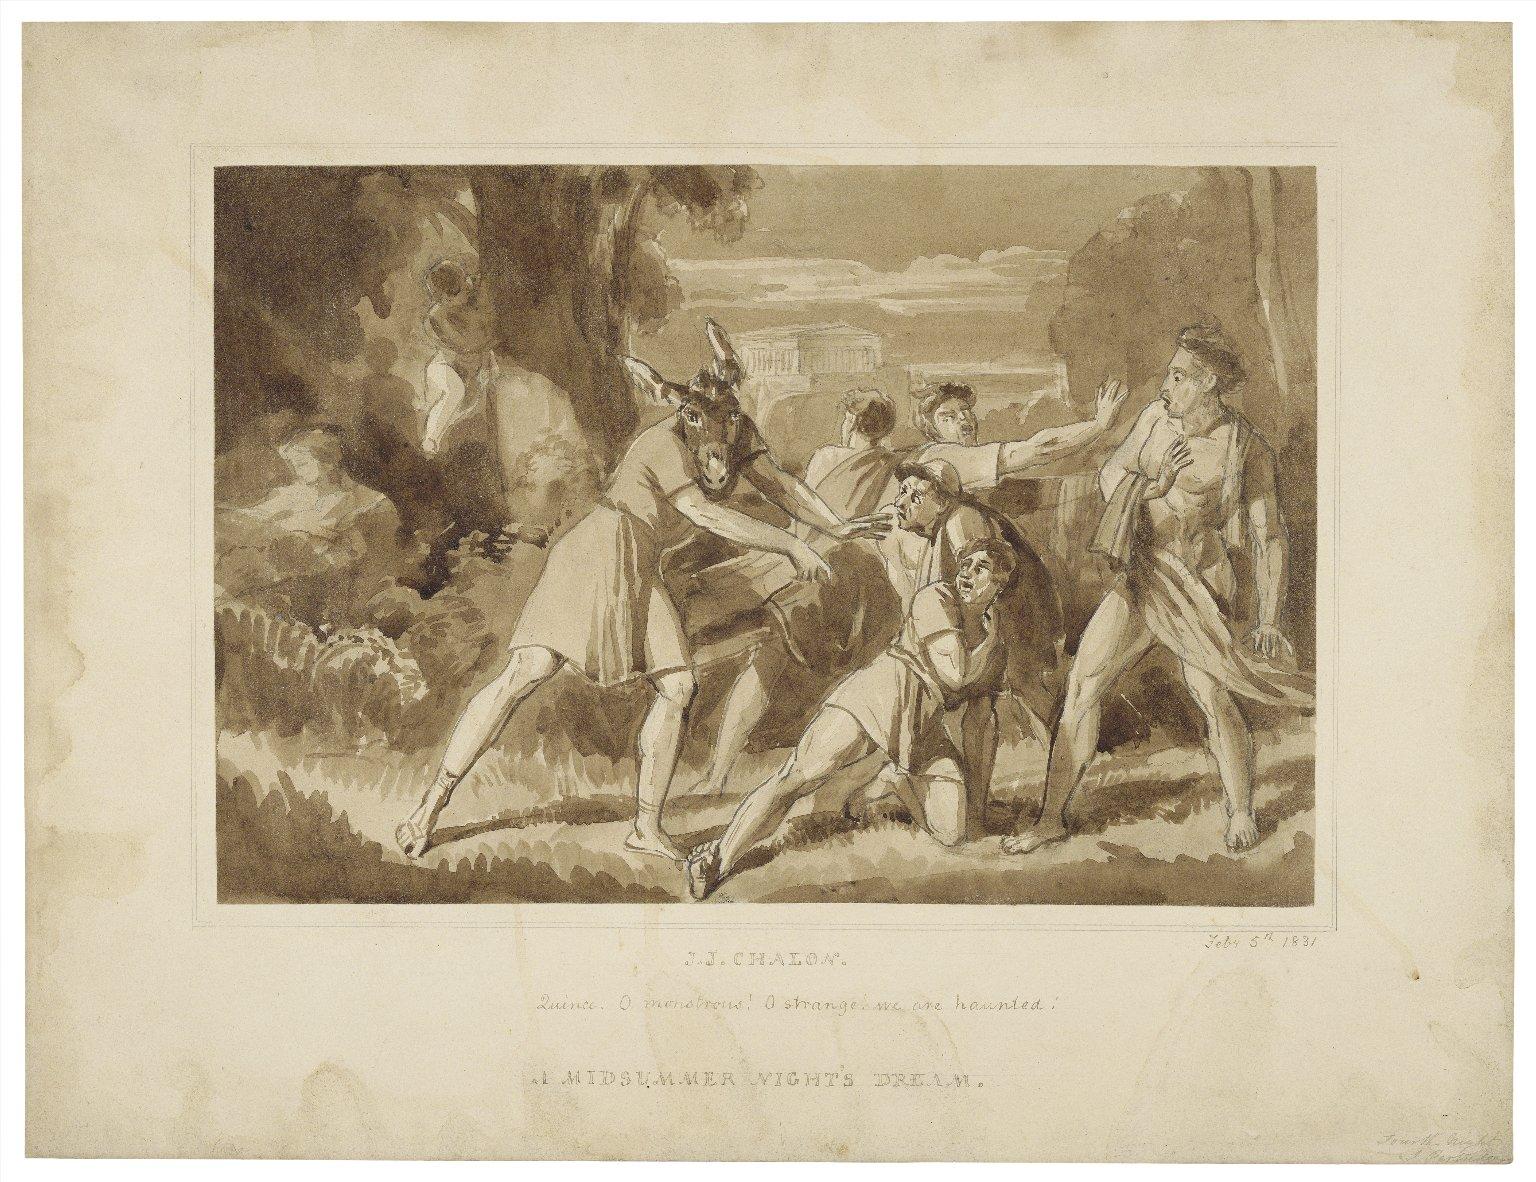 A midsummer night's dream, Quince: O monstrous! [III, 1] [graphic] / [John James Chalon].